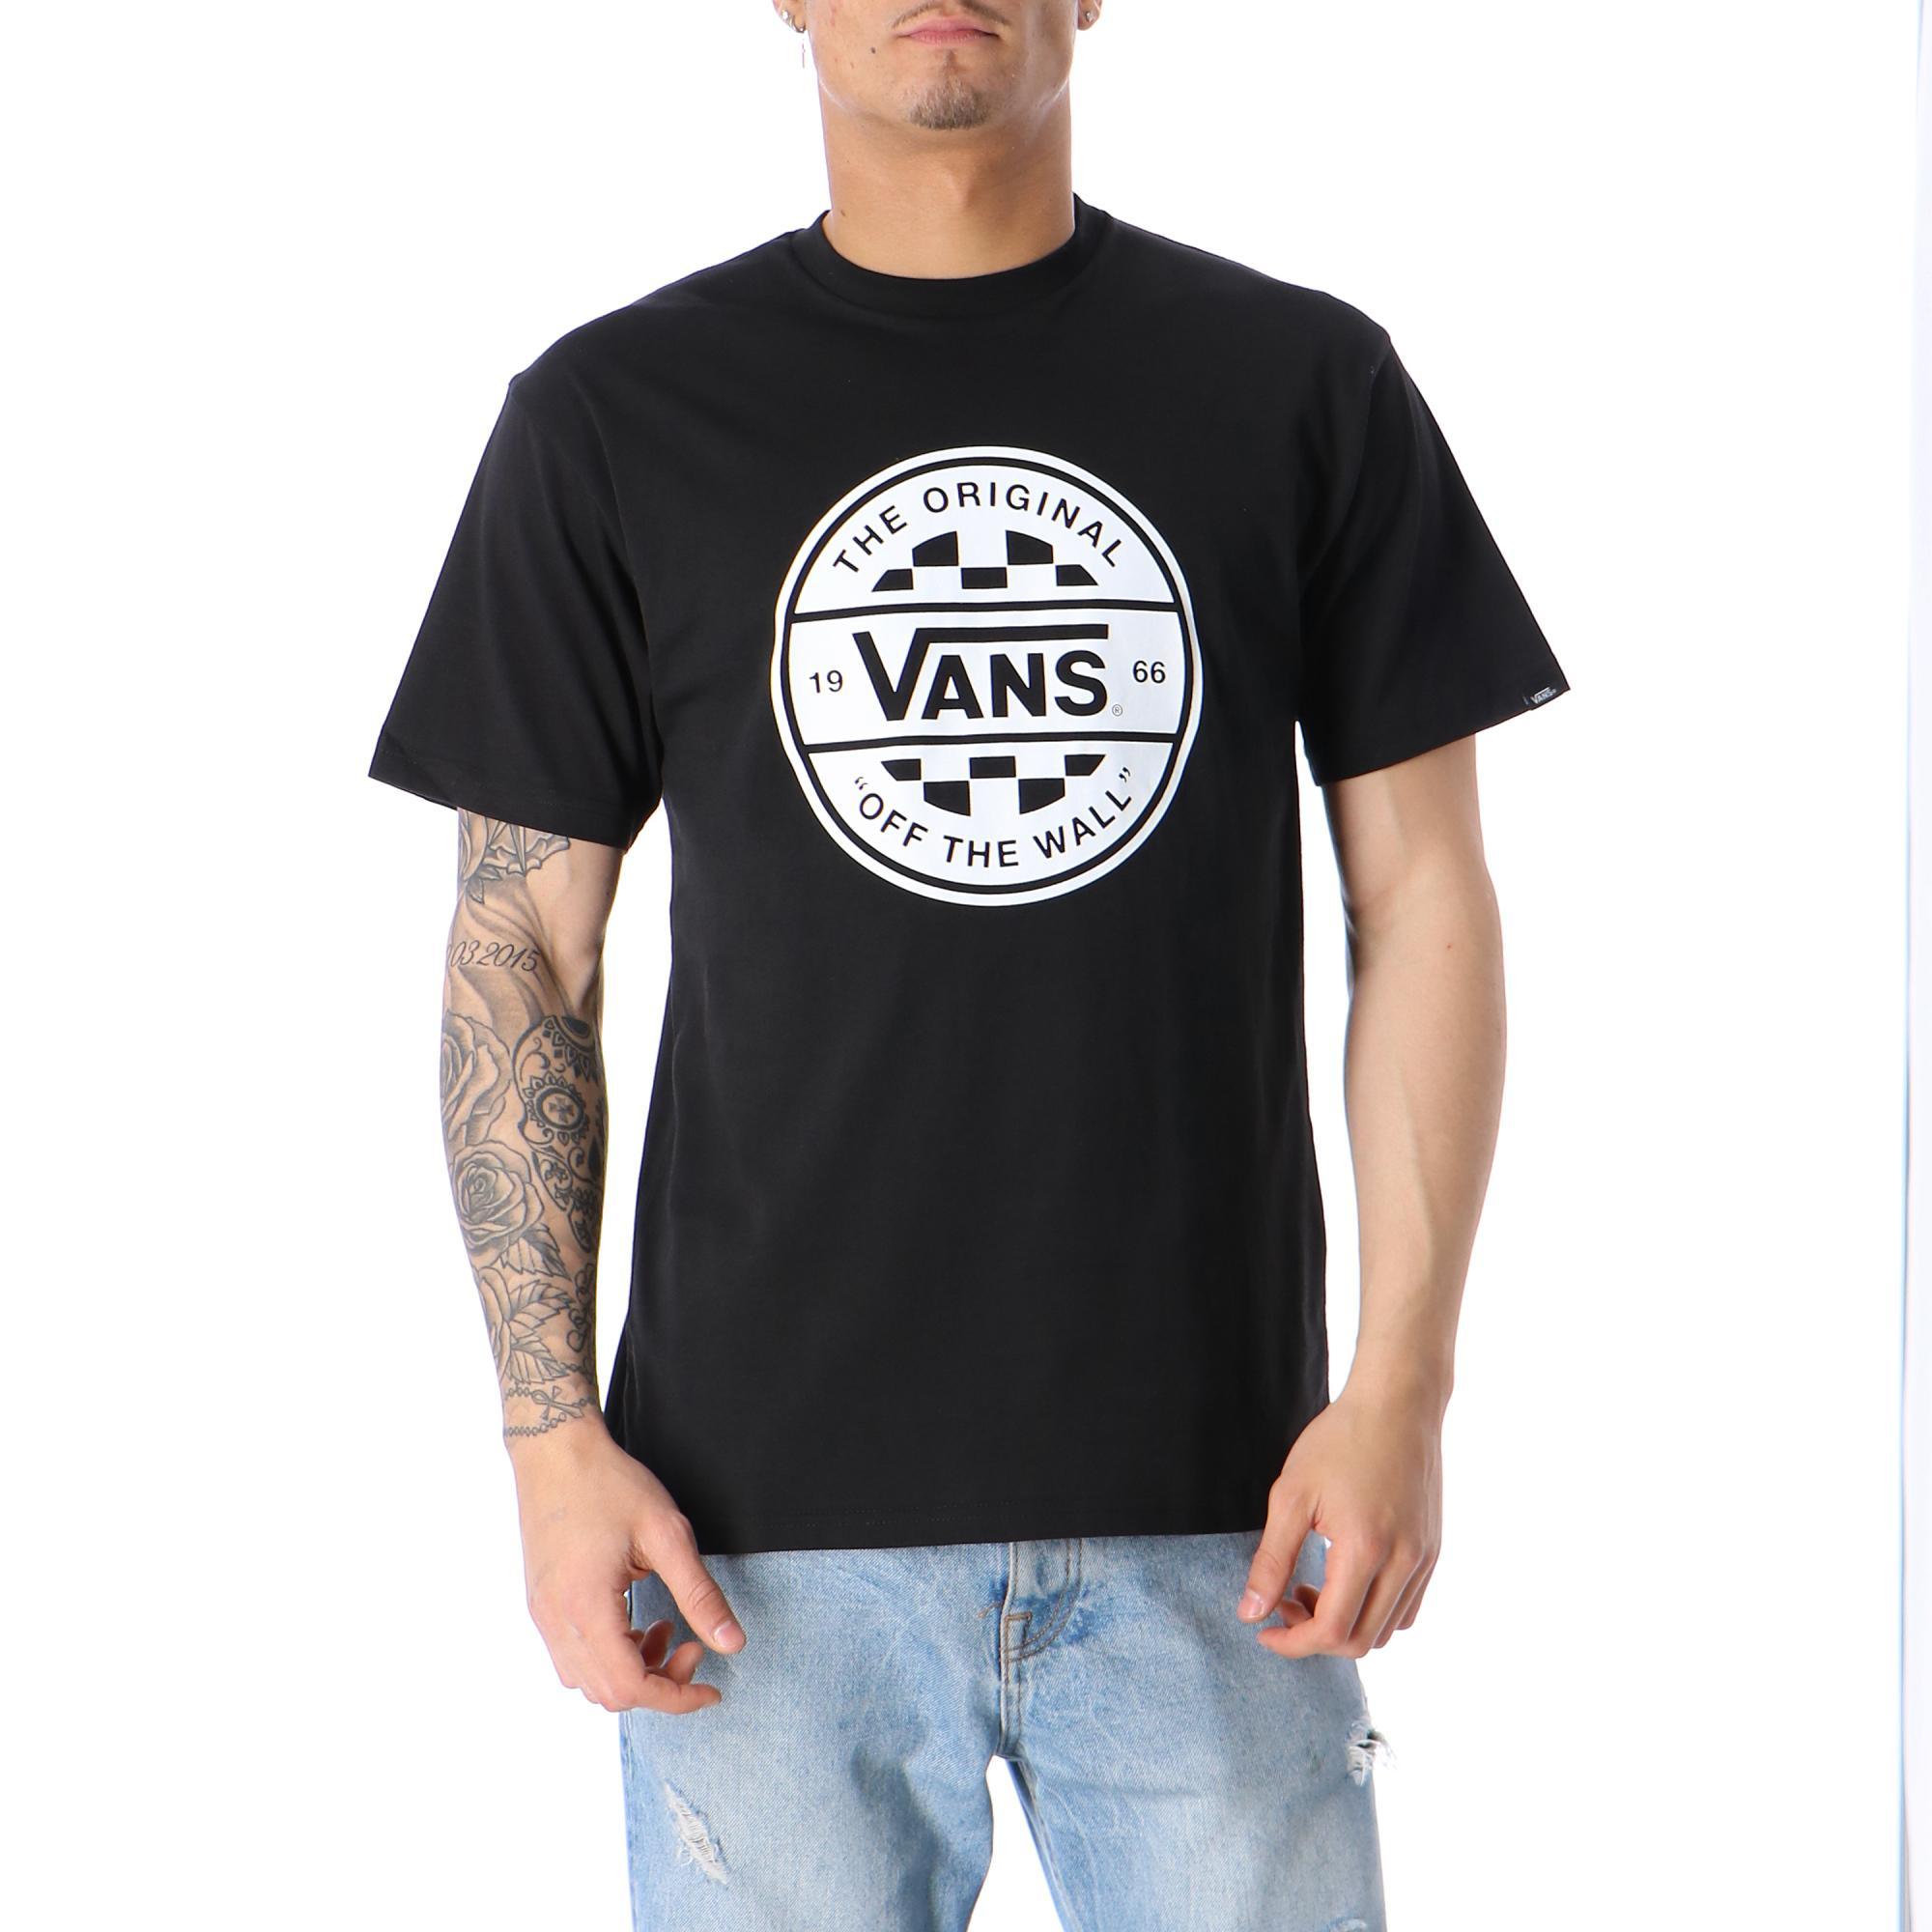 e47c3cf0 Vans Checker Co. Tee Black White | Treesse